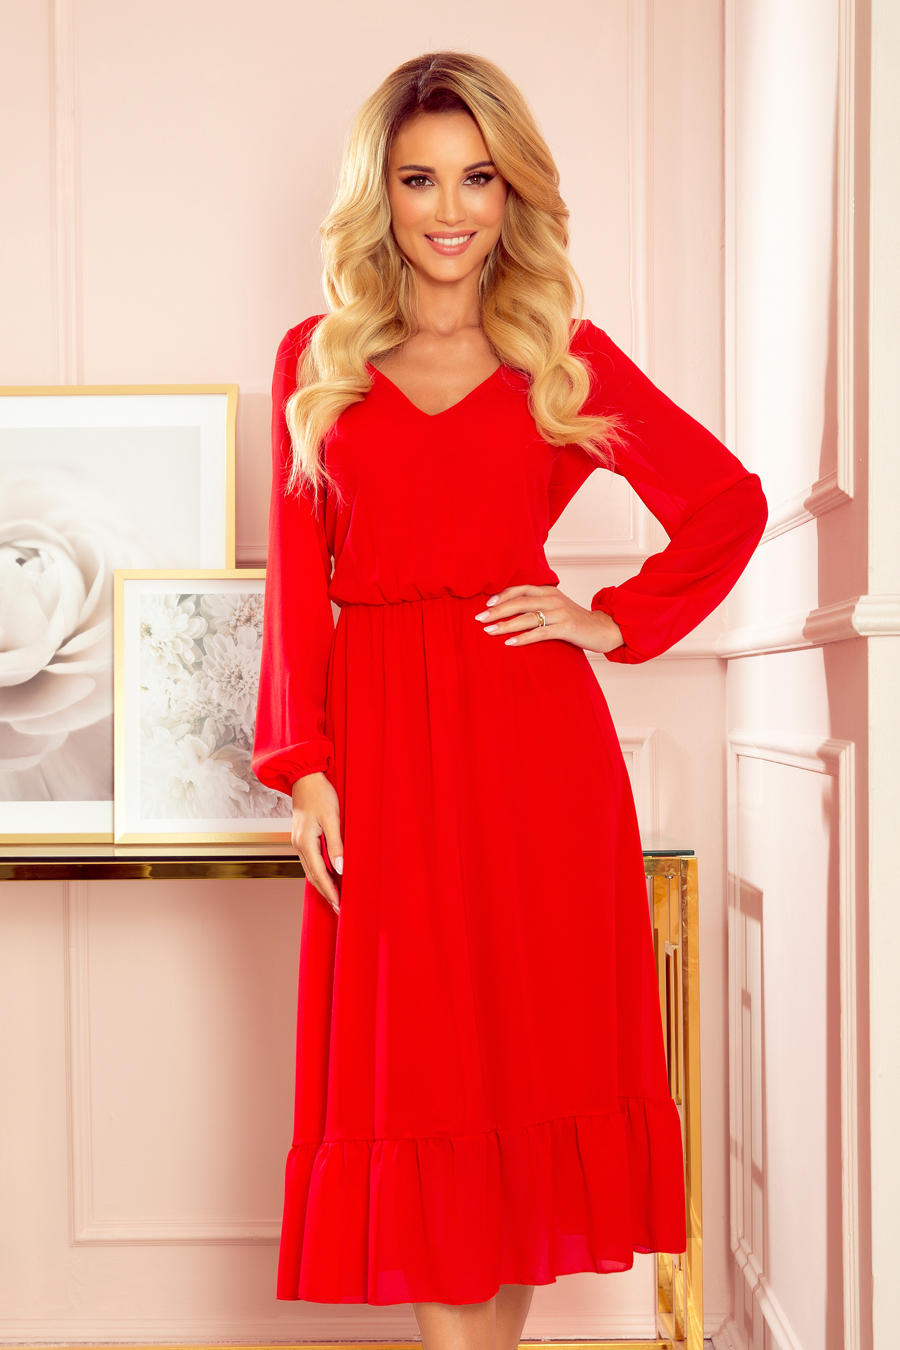 NUMOCO Šifónové midi šaty s výstřihem a volánkem 304-3 Barva: Červená, Velikost: S